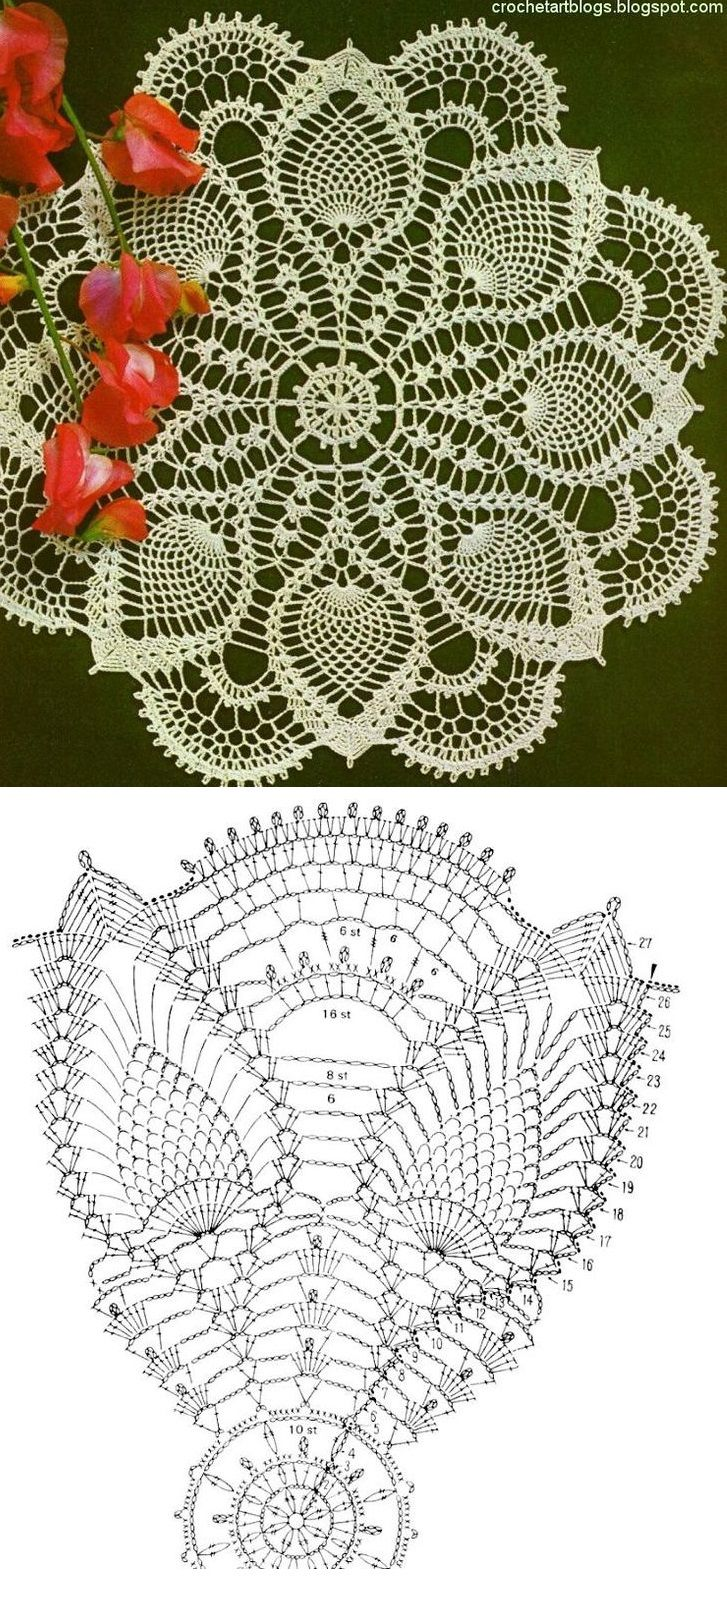 Crochet Lace Patterns Diagram : Meer dan 1000 idee?n over Crochet Doily Diagram op ...